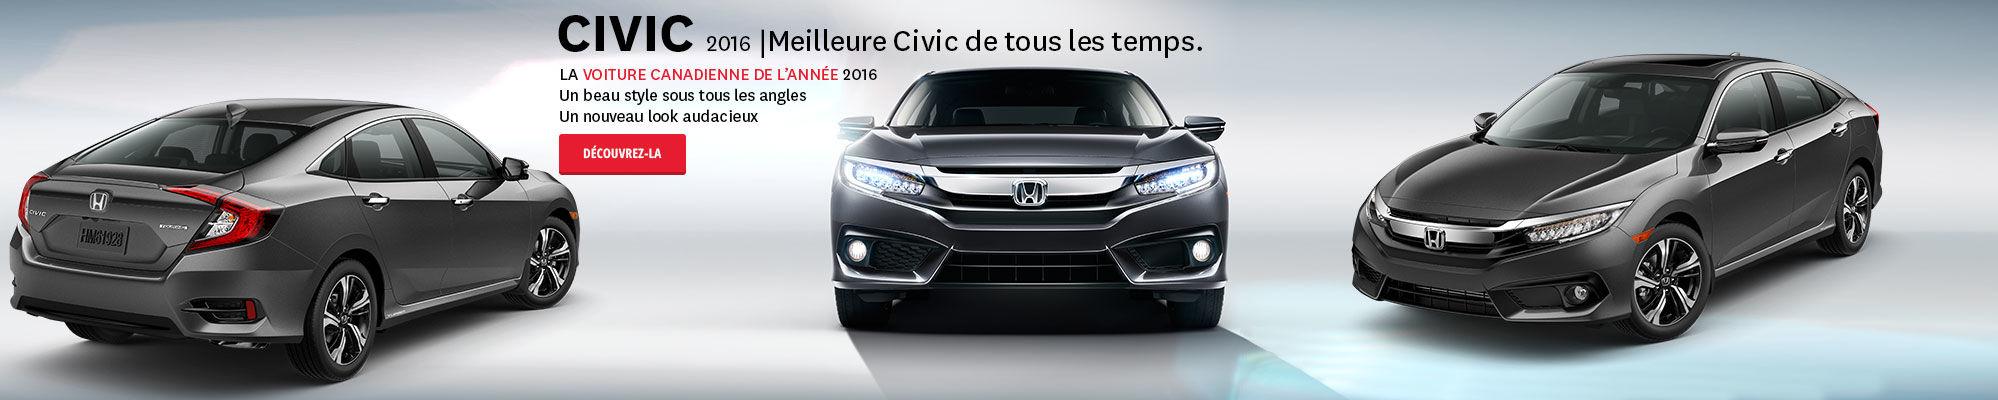 Civic 2016